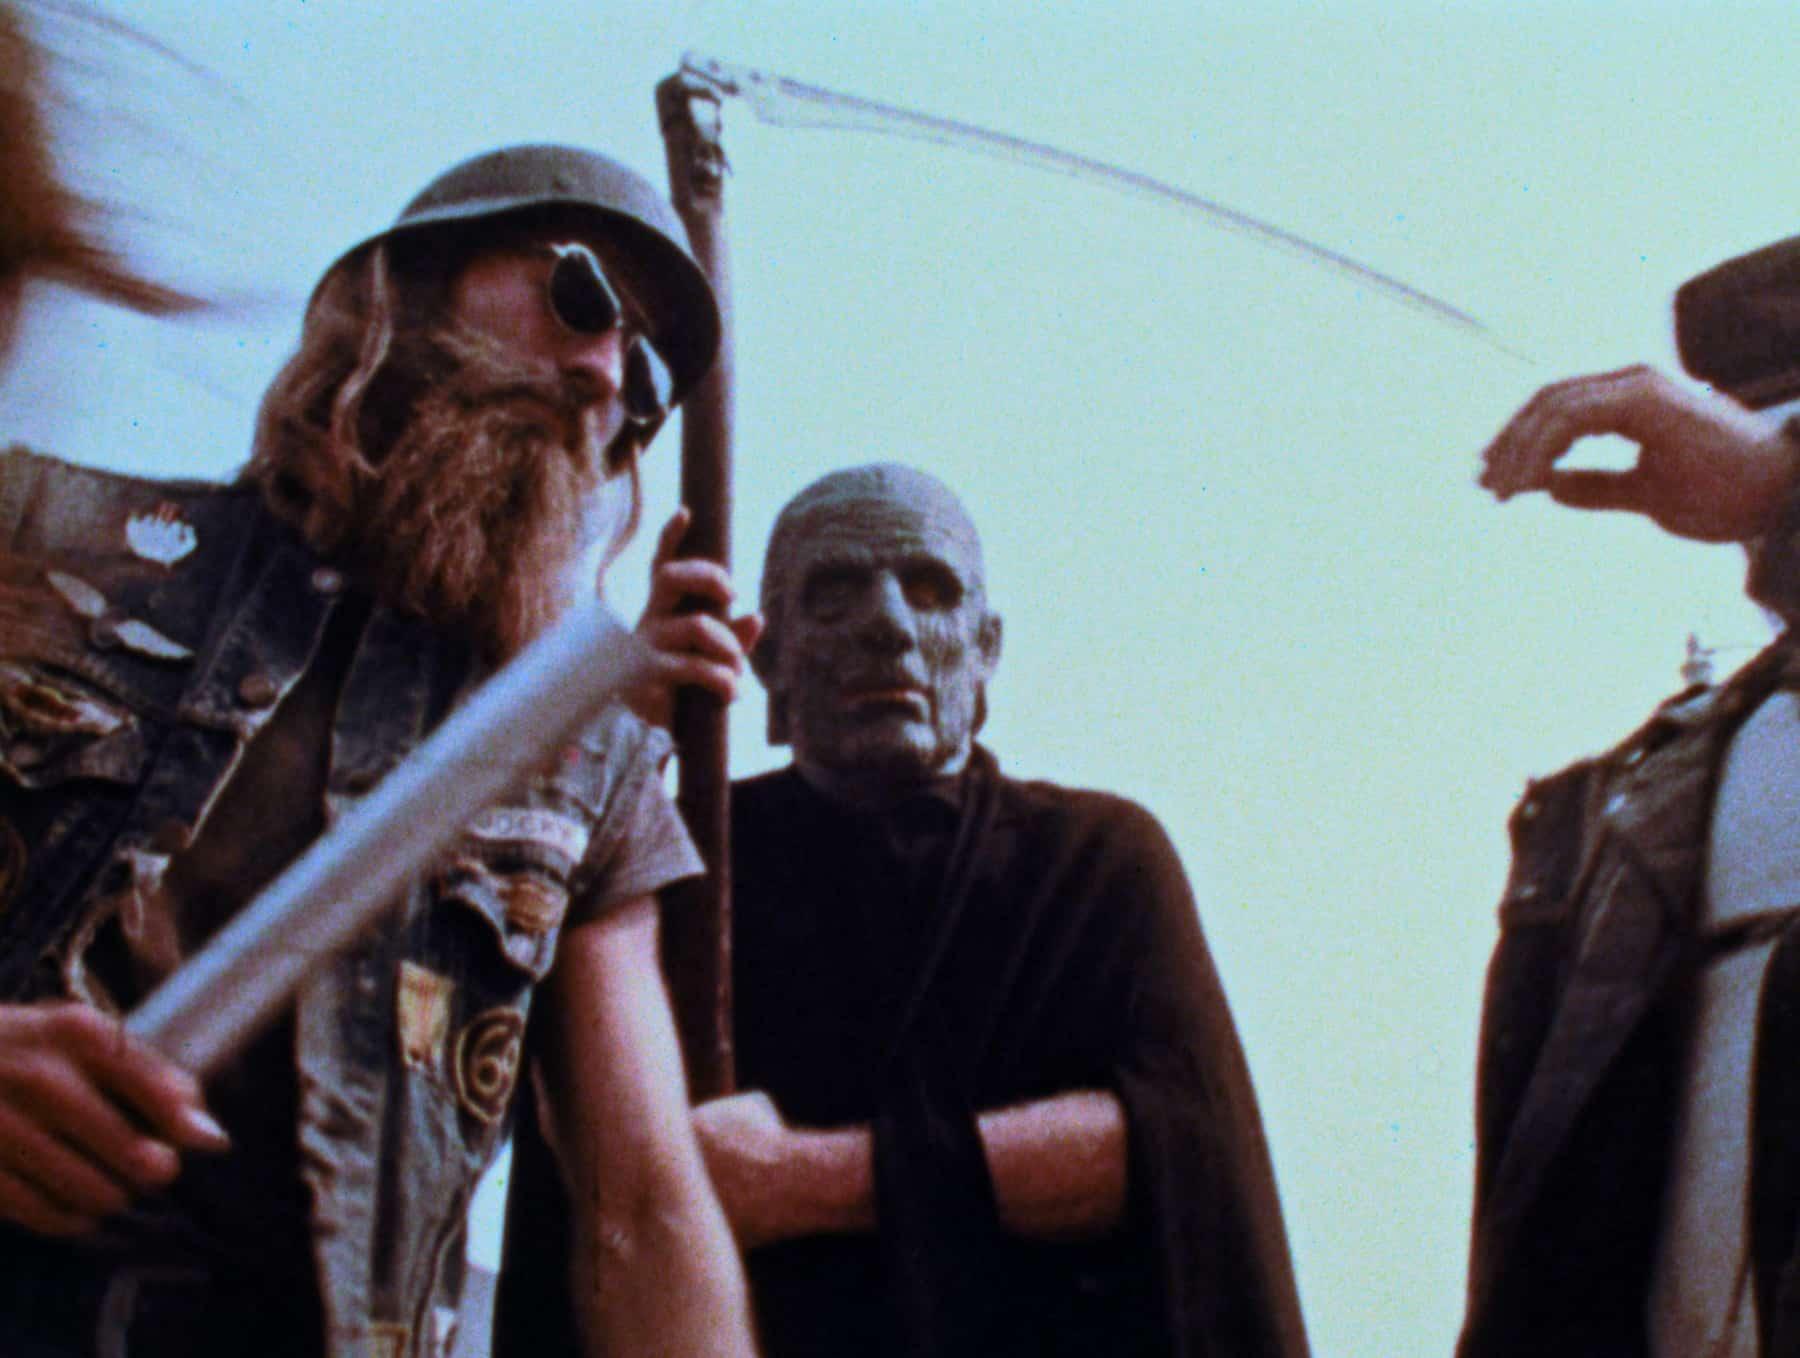 George Romero's lost film The Amusement Park returns via Shudder (2021) 8